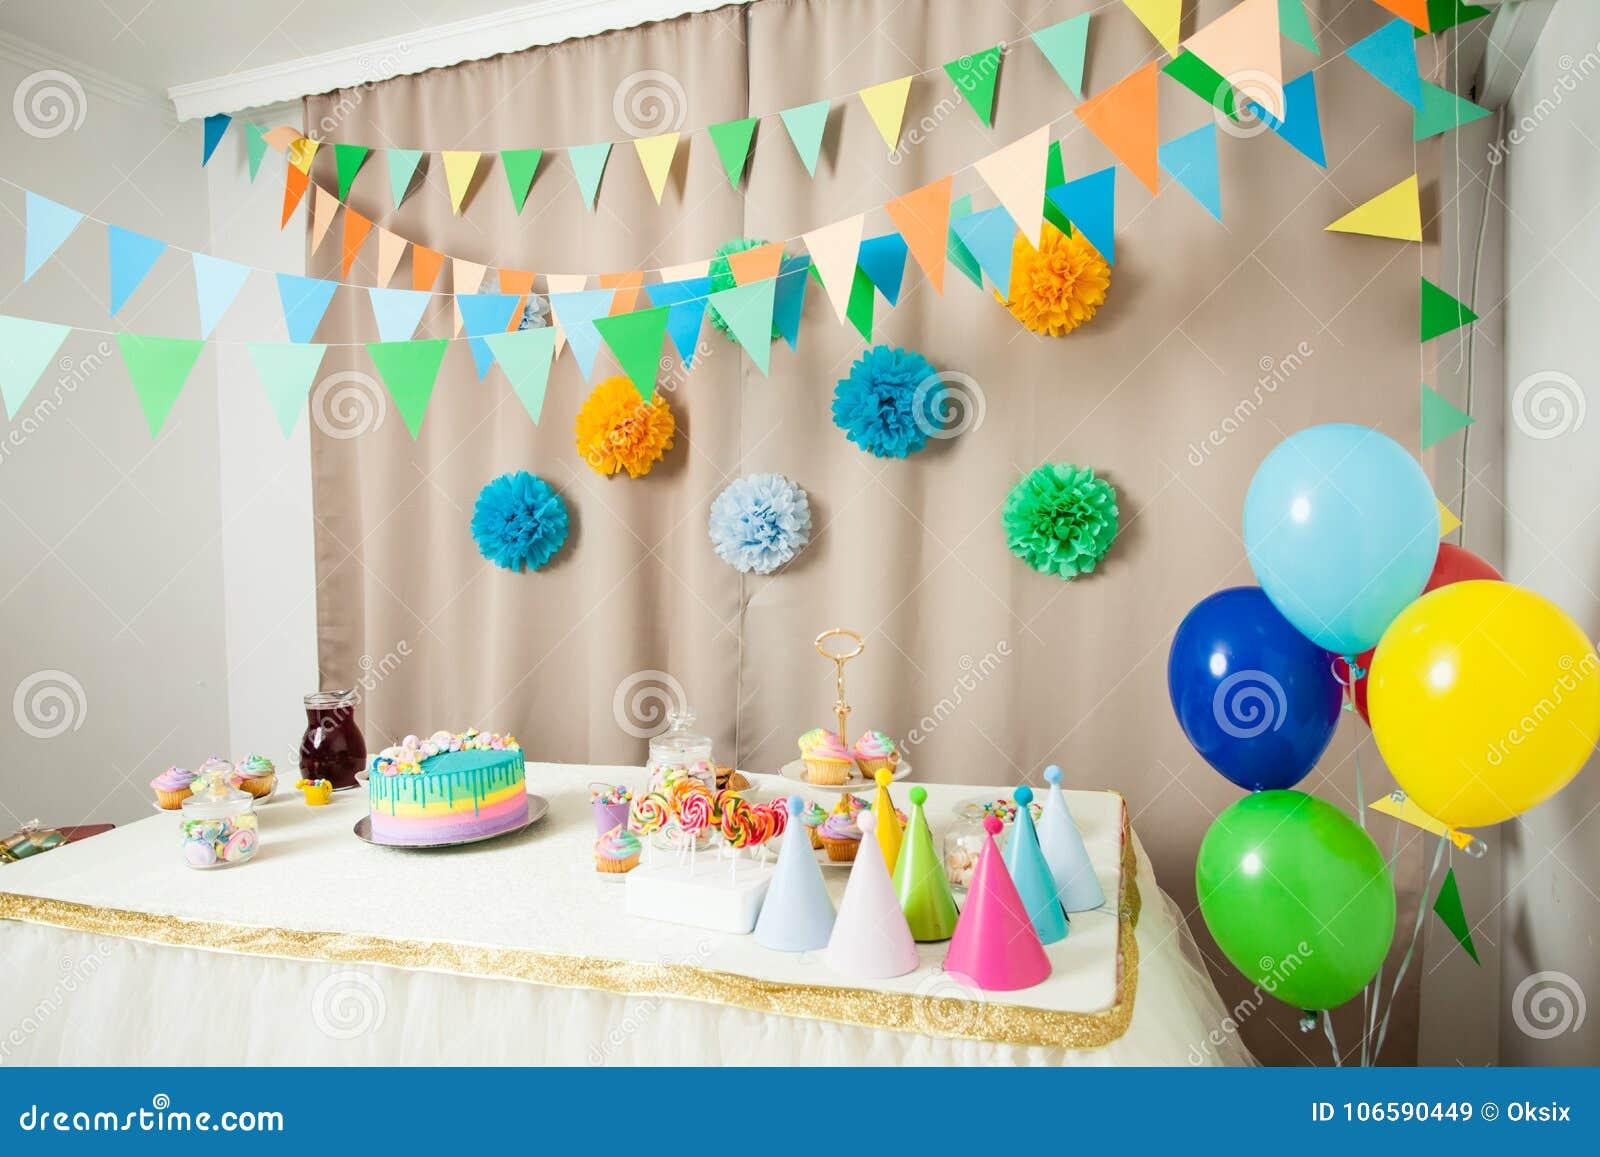 Decoraci n del feliz cumplea os imagen de archivo imagen for Cuartos decorados feliz cumpleanos